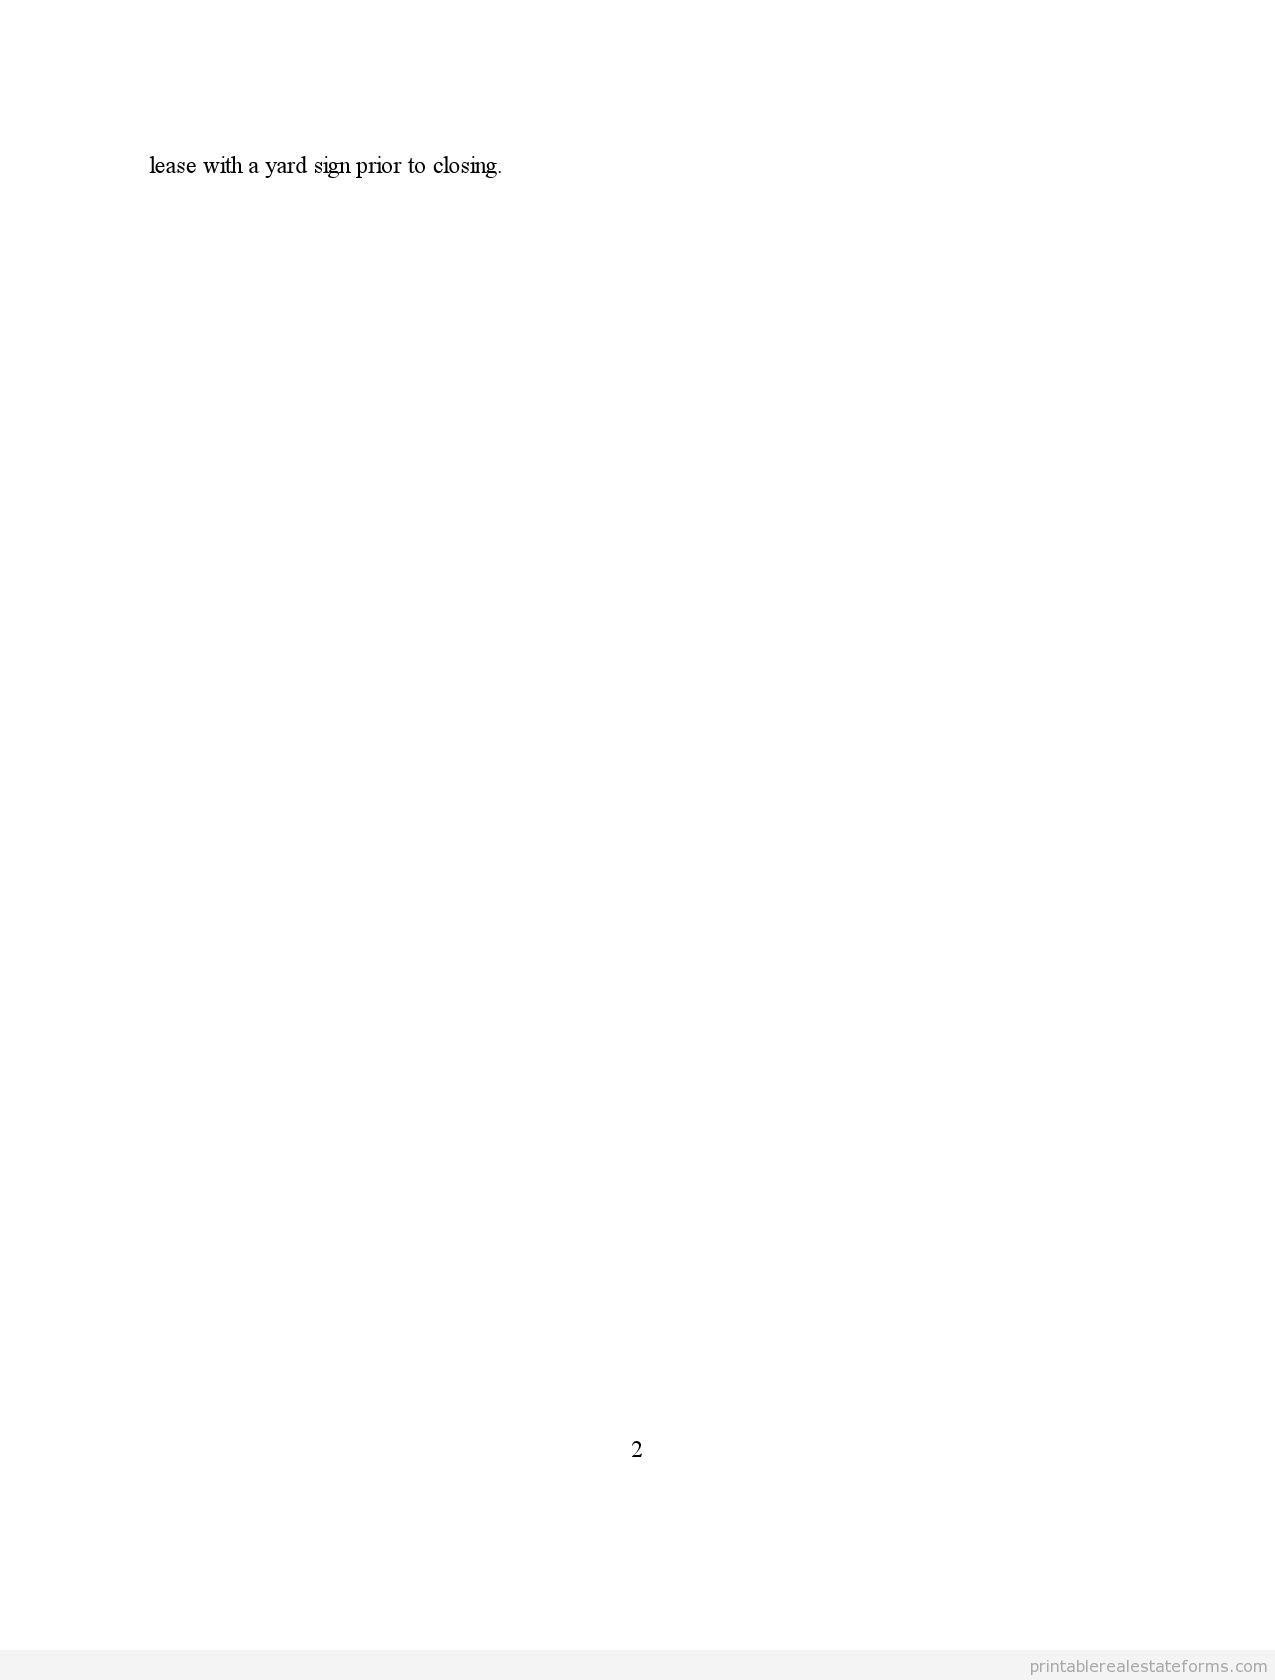 Sample Printable Contractaddendum Form